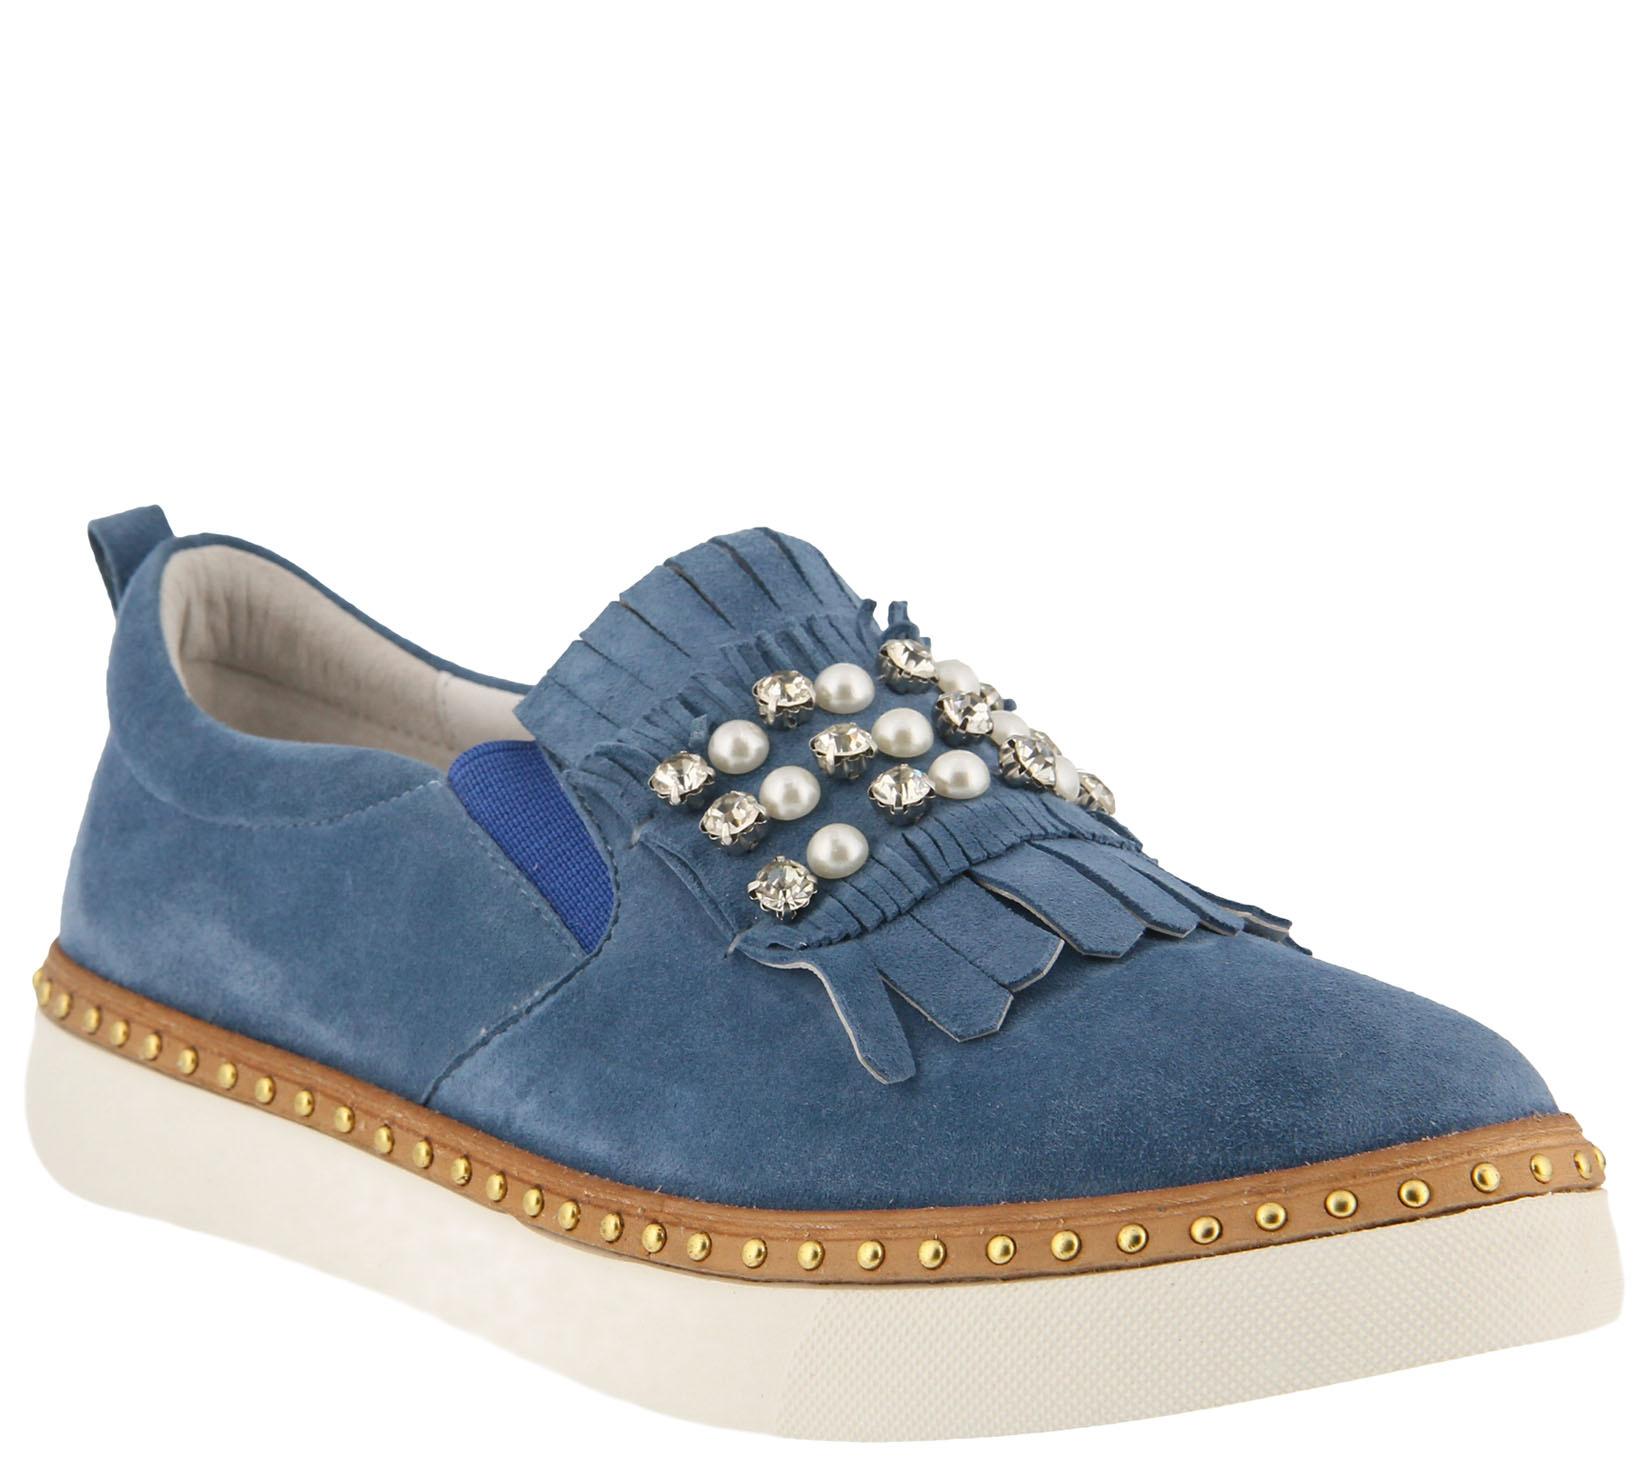 Azura by Spring Step Slip-On Sneakers - Marialuv